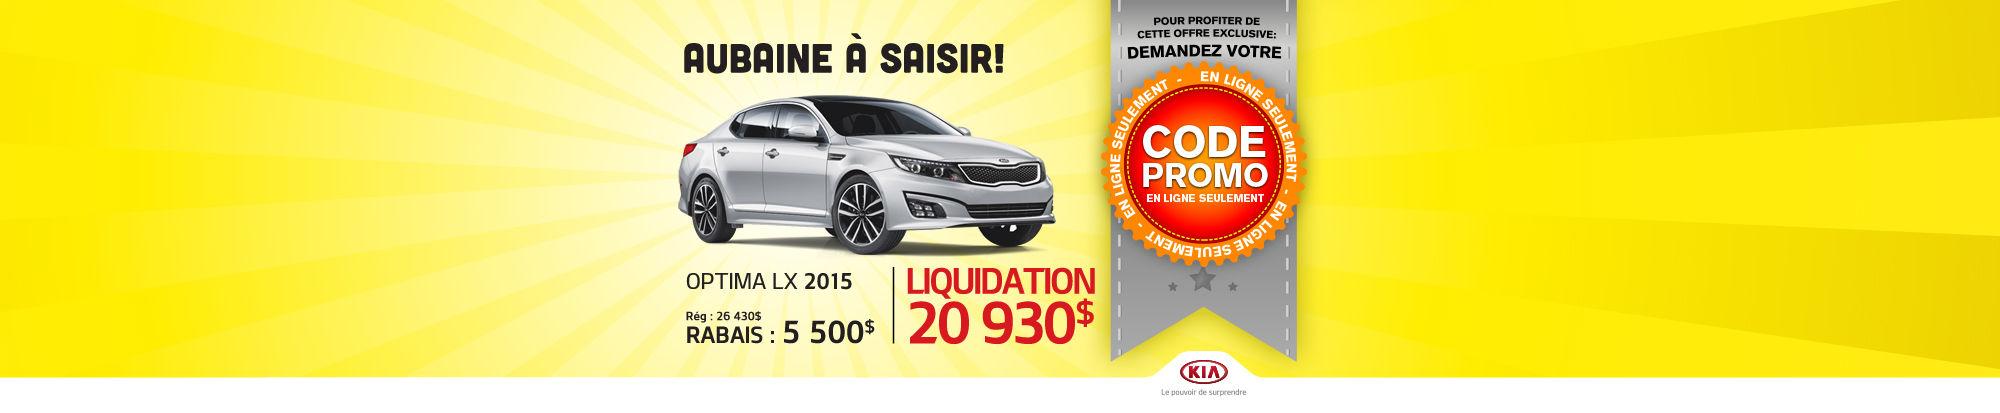 Code promo - Kia Optima LX 2015